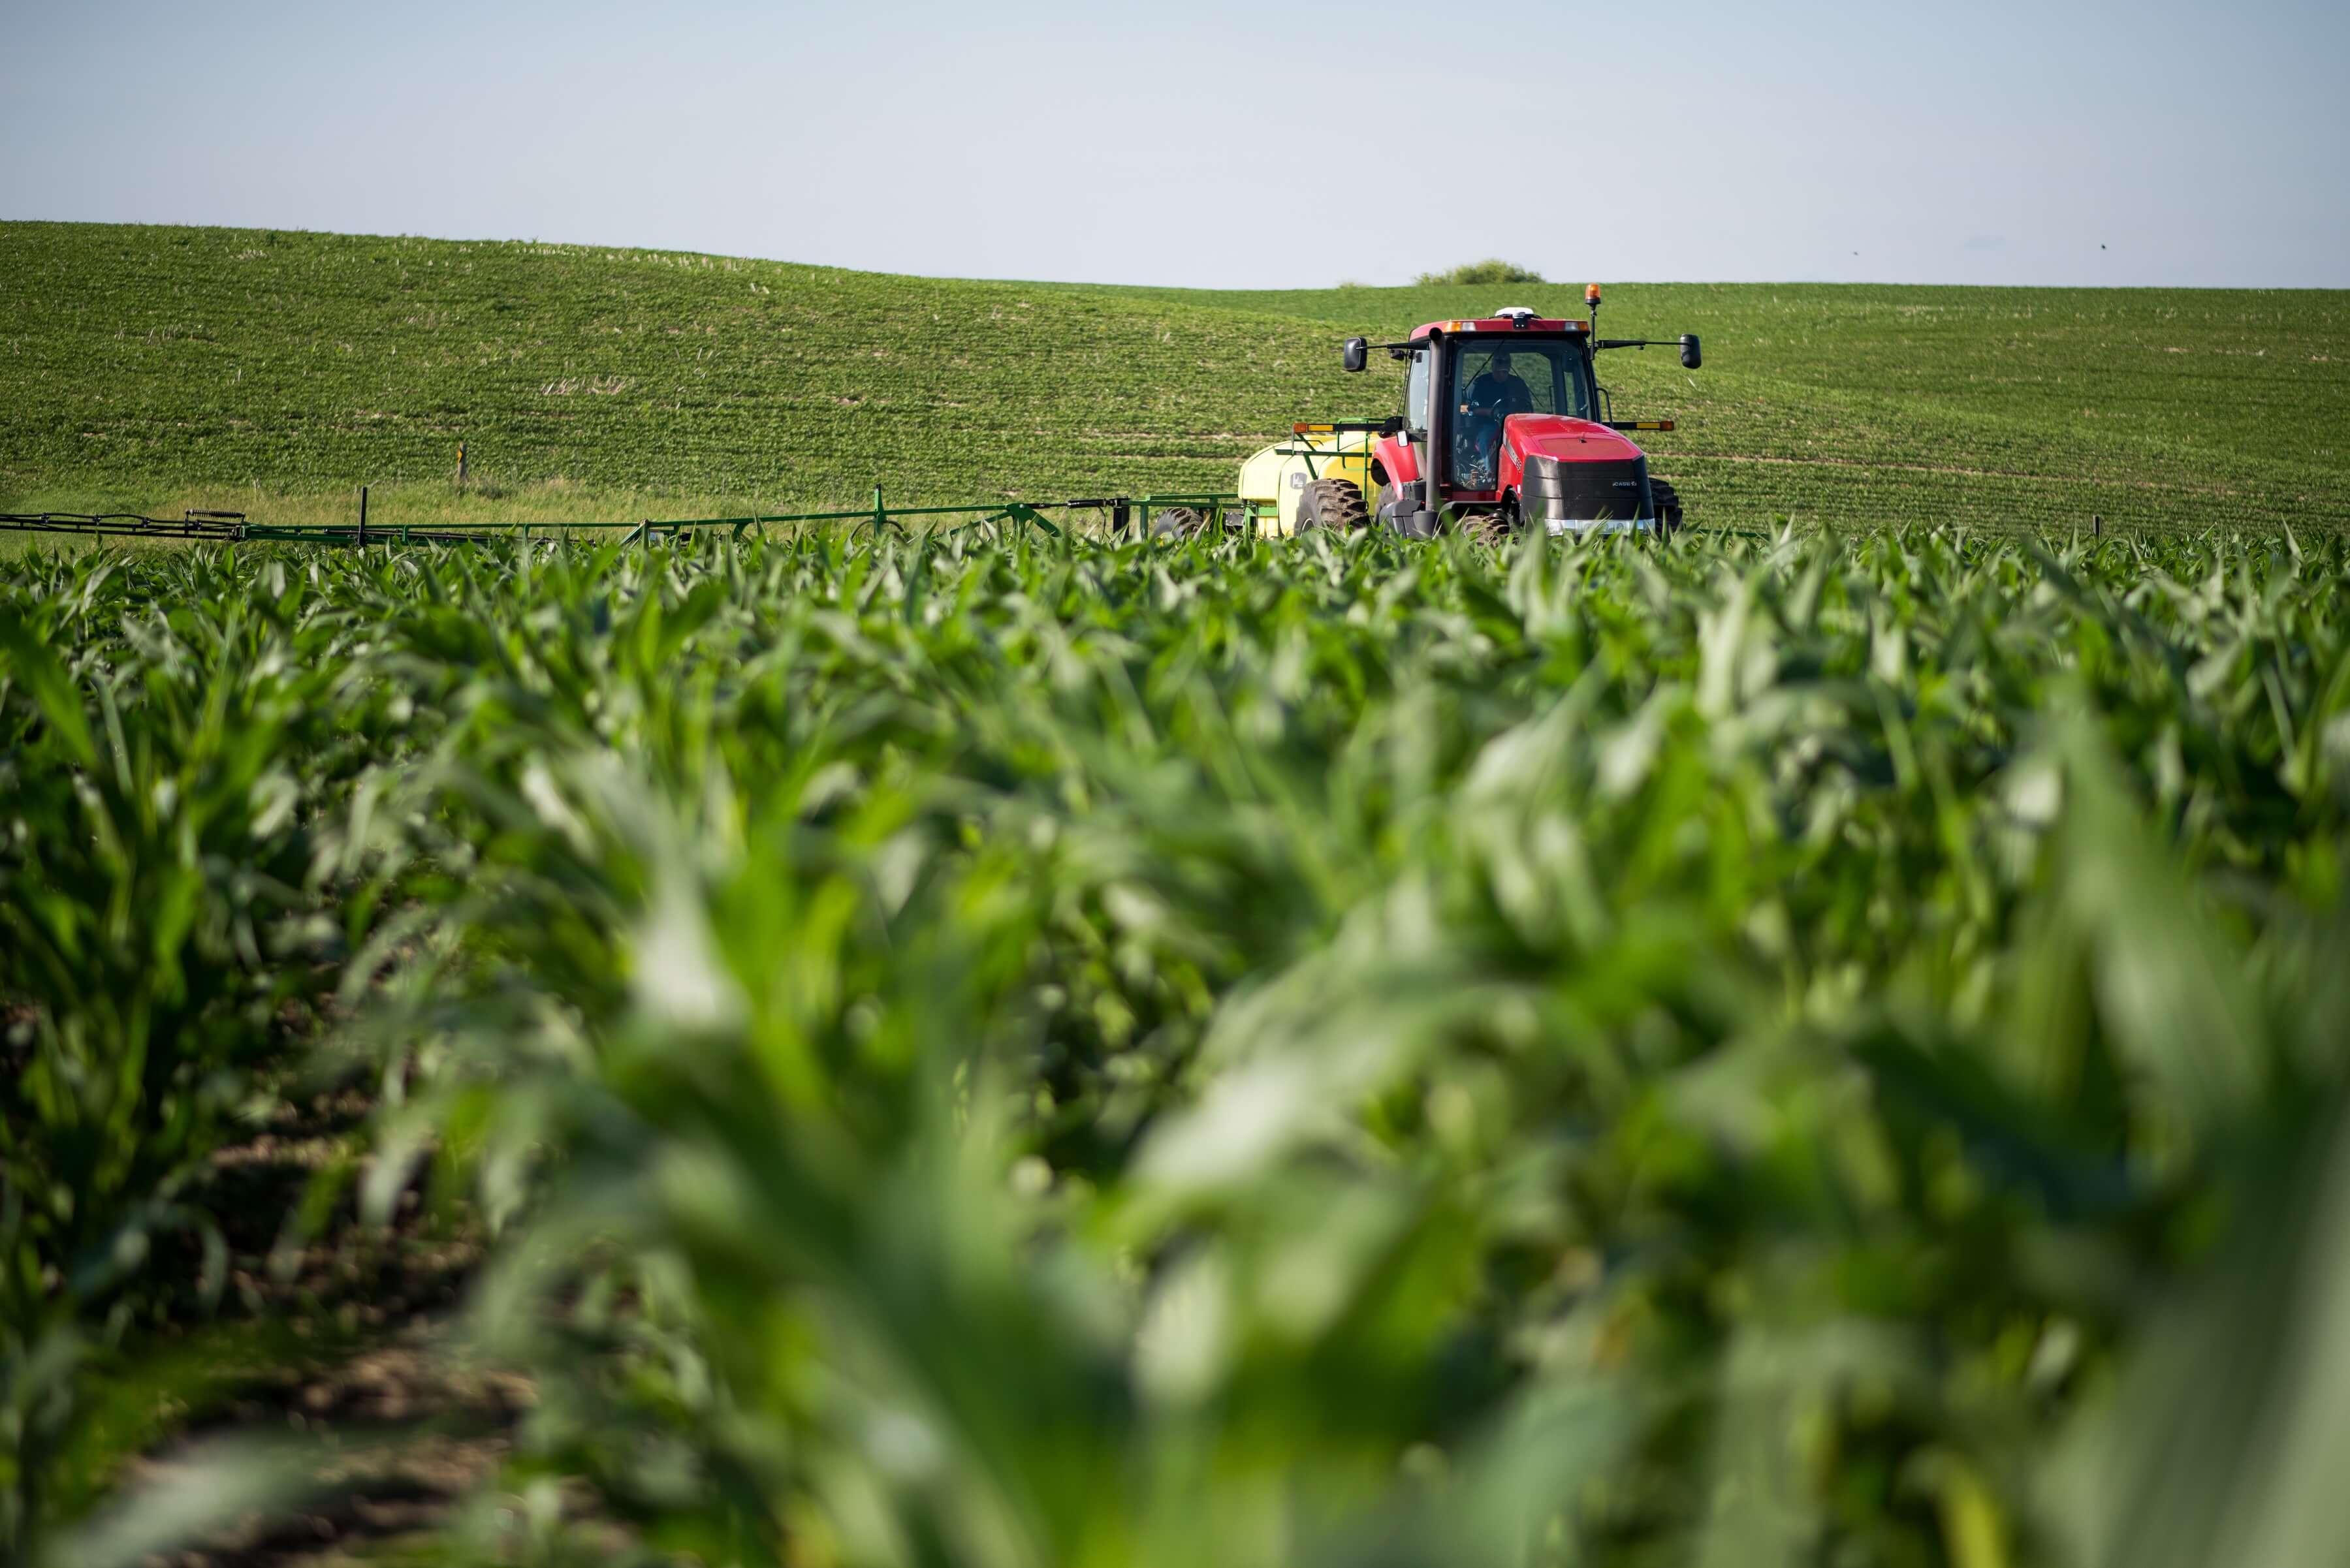 Nitrogen fertilizer application